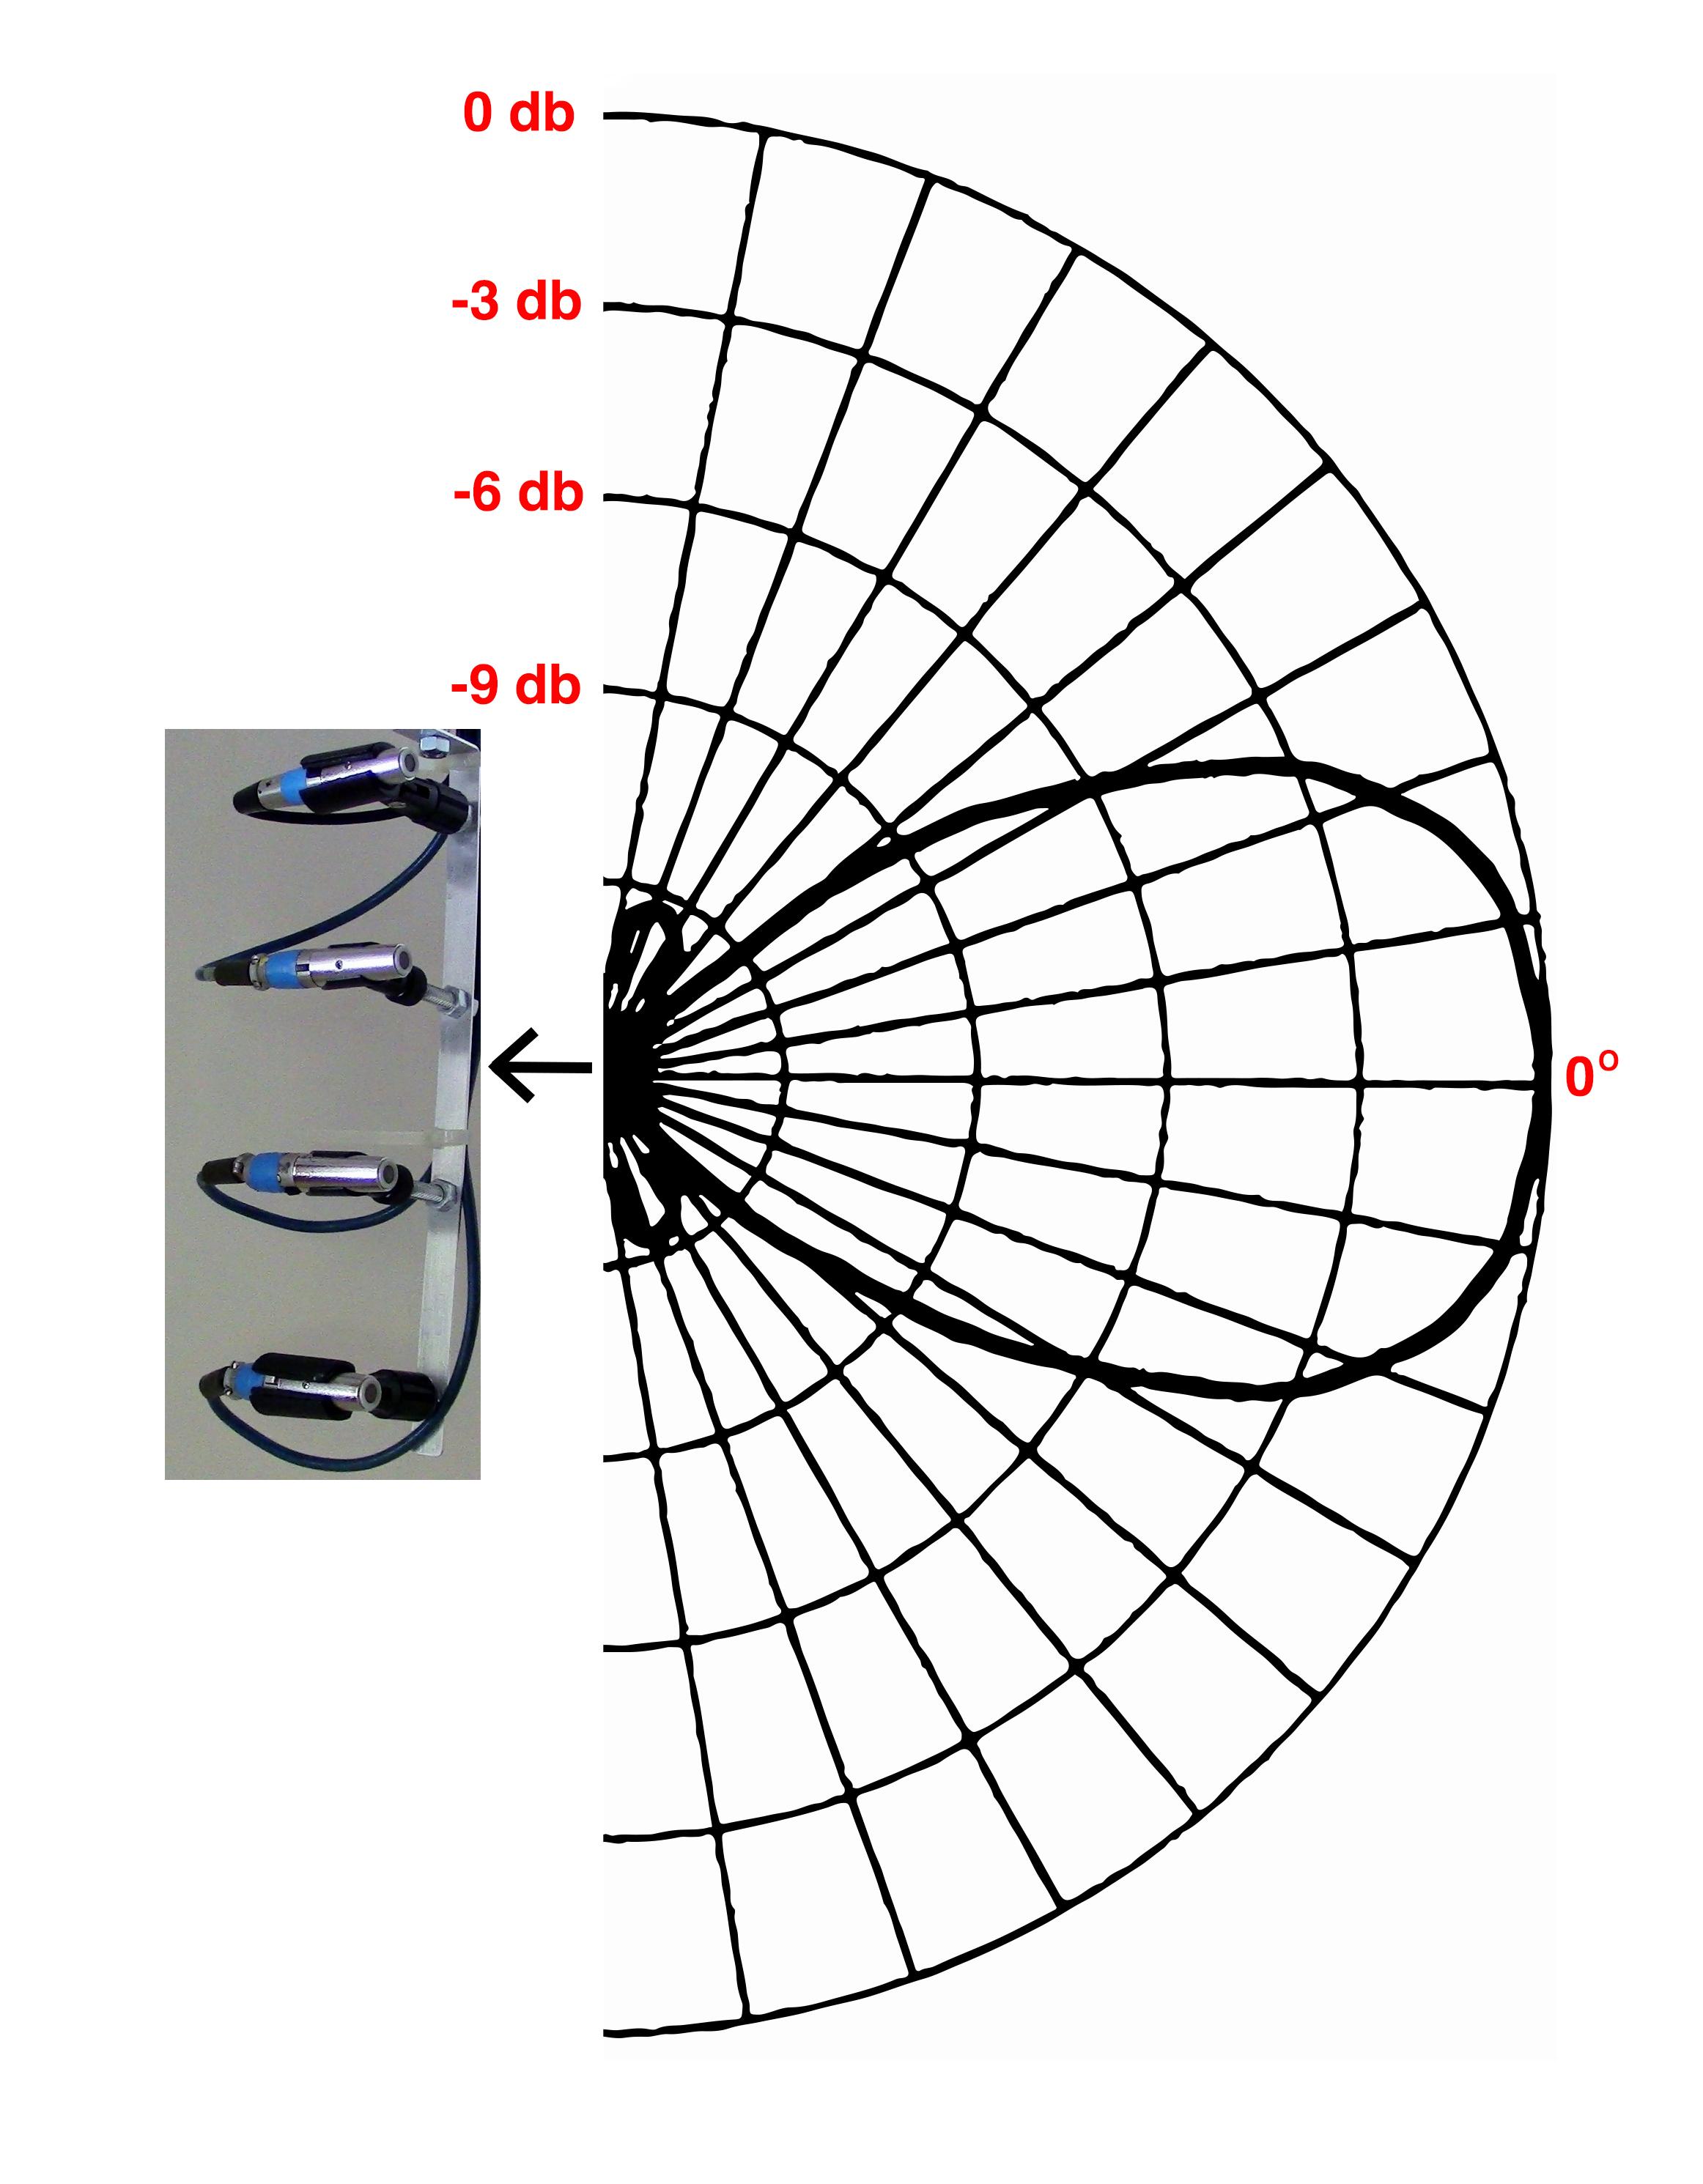 akg d112 wiring diagram